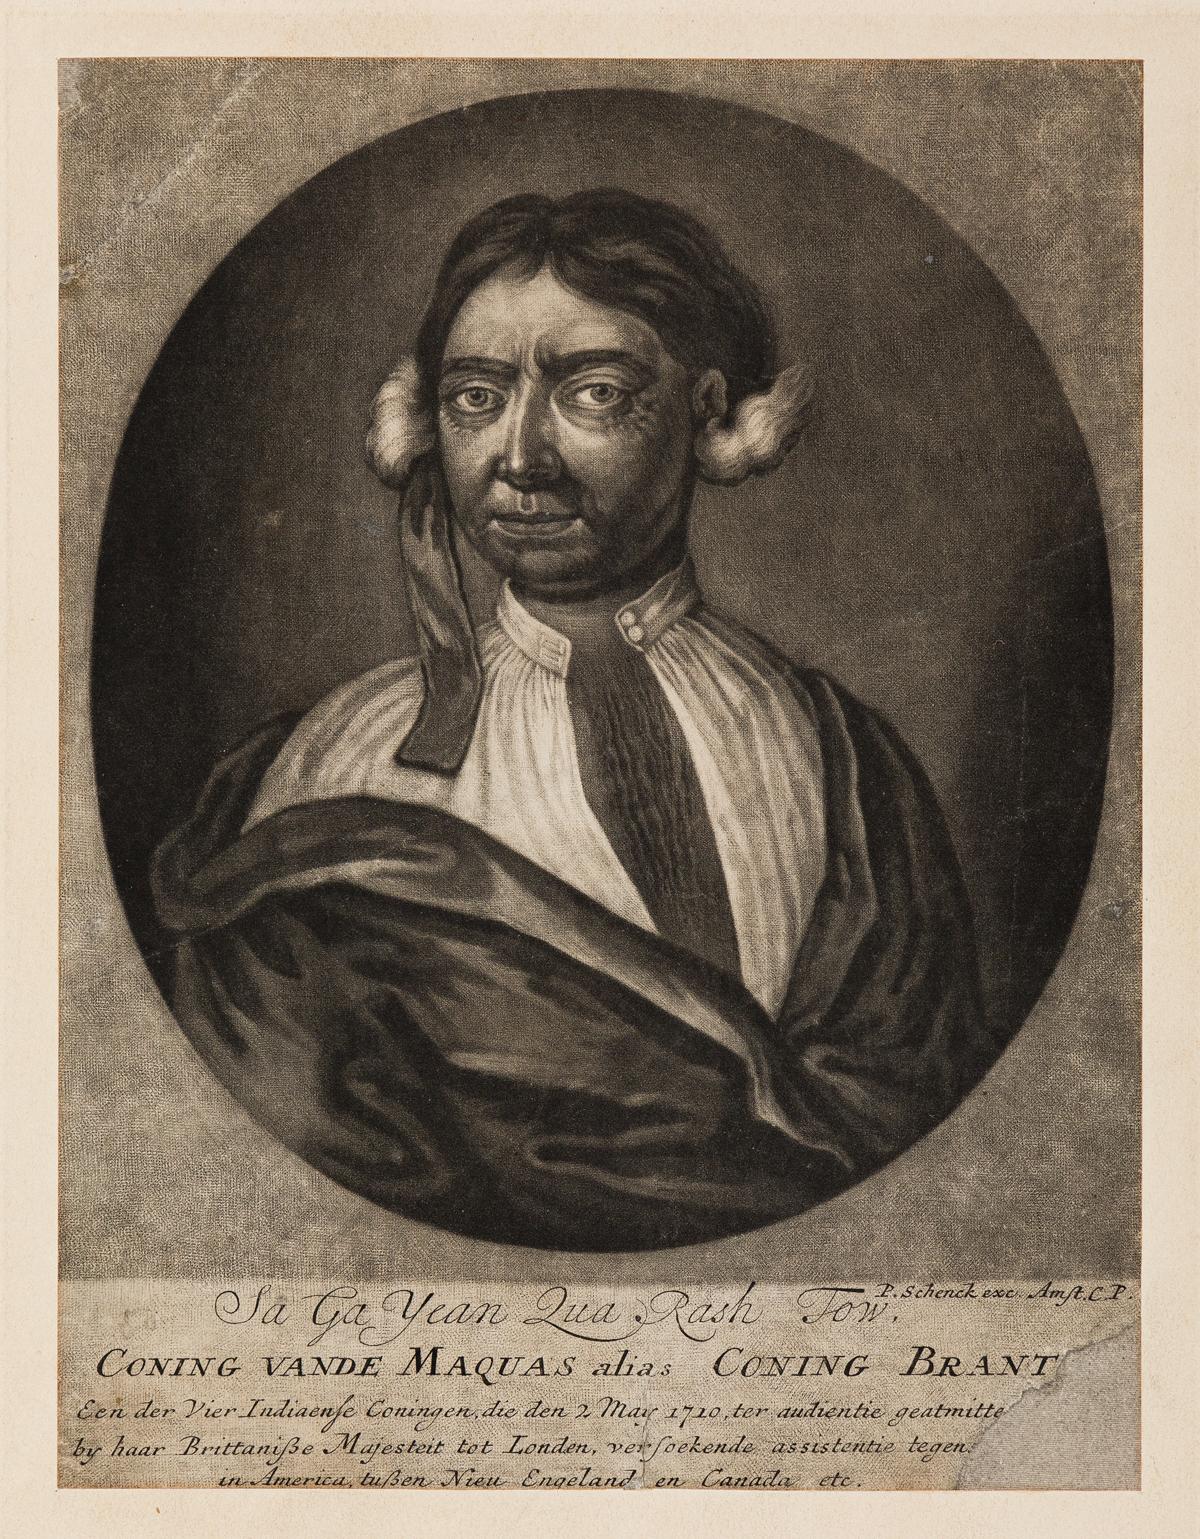 (AMERICAN-INDIANS)-Pieter-Schenck-engraver;-after-Faber-Sa-Ga-Yean-Qua-Rash-Tow-Coning-Vande-Maquas-alias-Coning-Brant